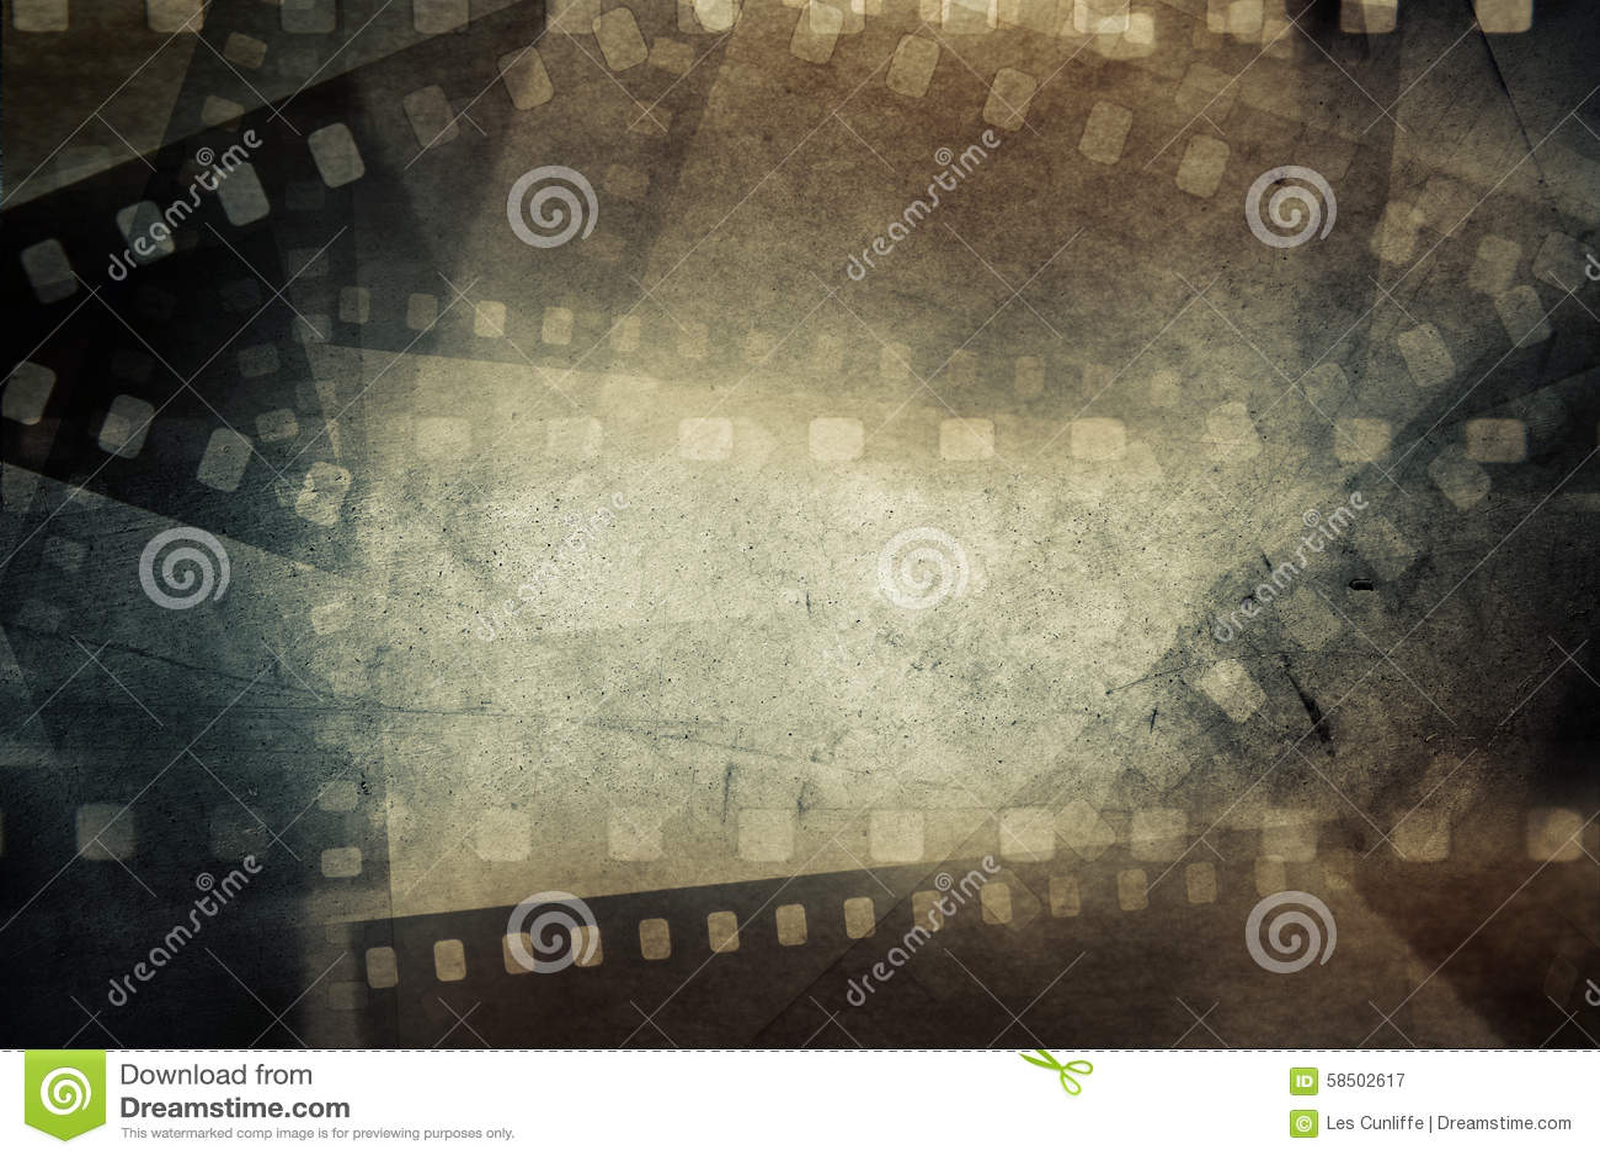 Film Frames Stock Photo - Image: 58502617